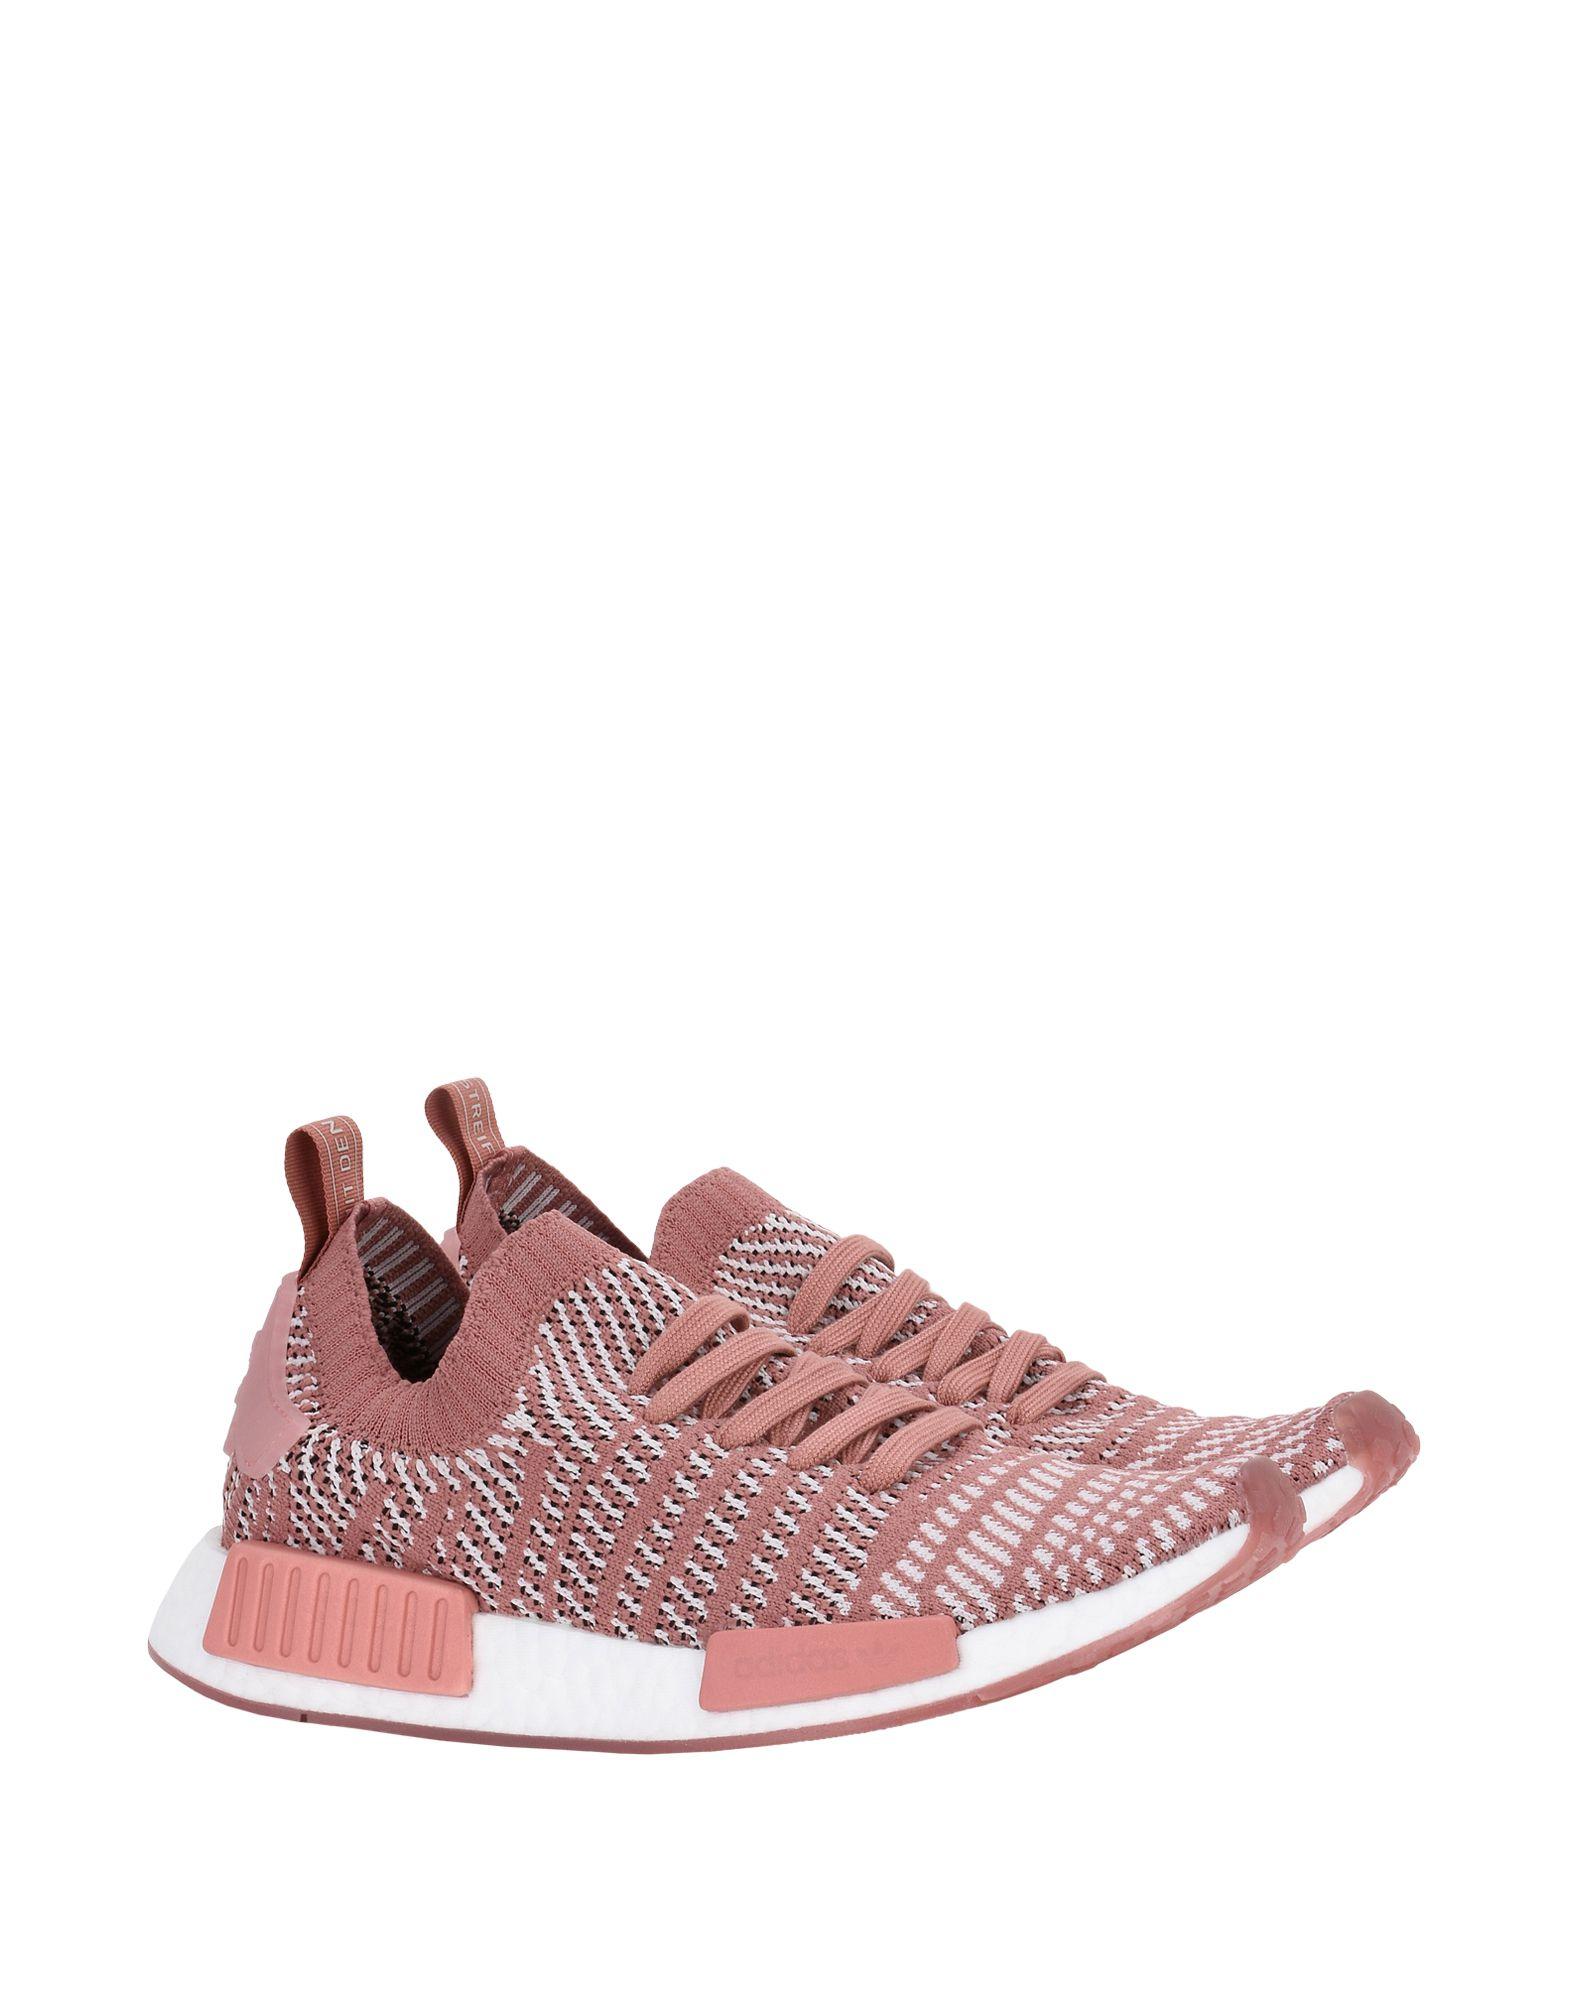 Adidas Originals Nmd_R1 Stlt Pk W  11432094TA Gute Qualität beliebte Schuhe